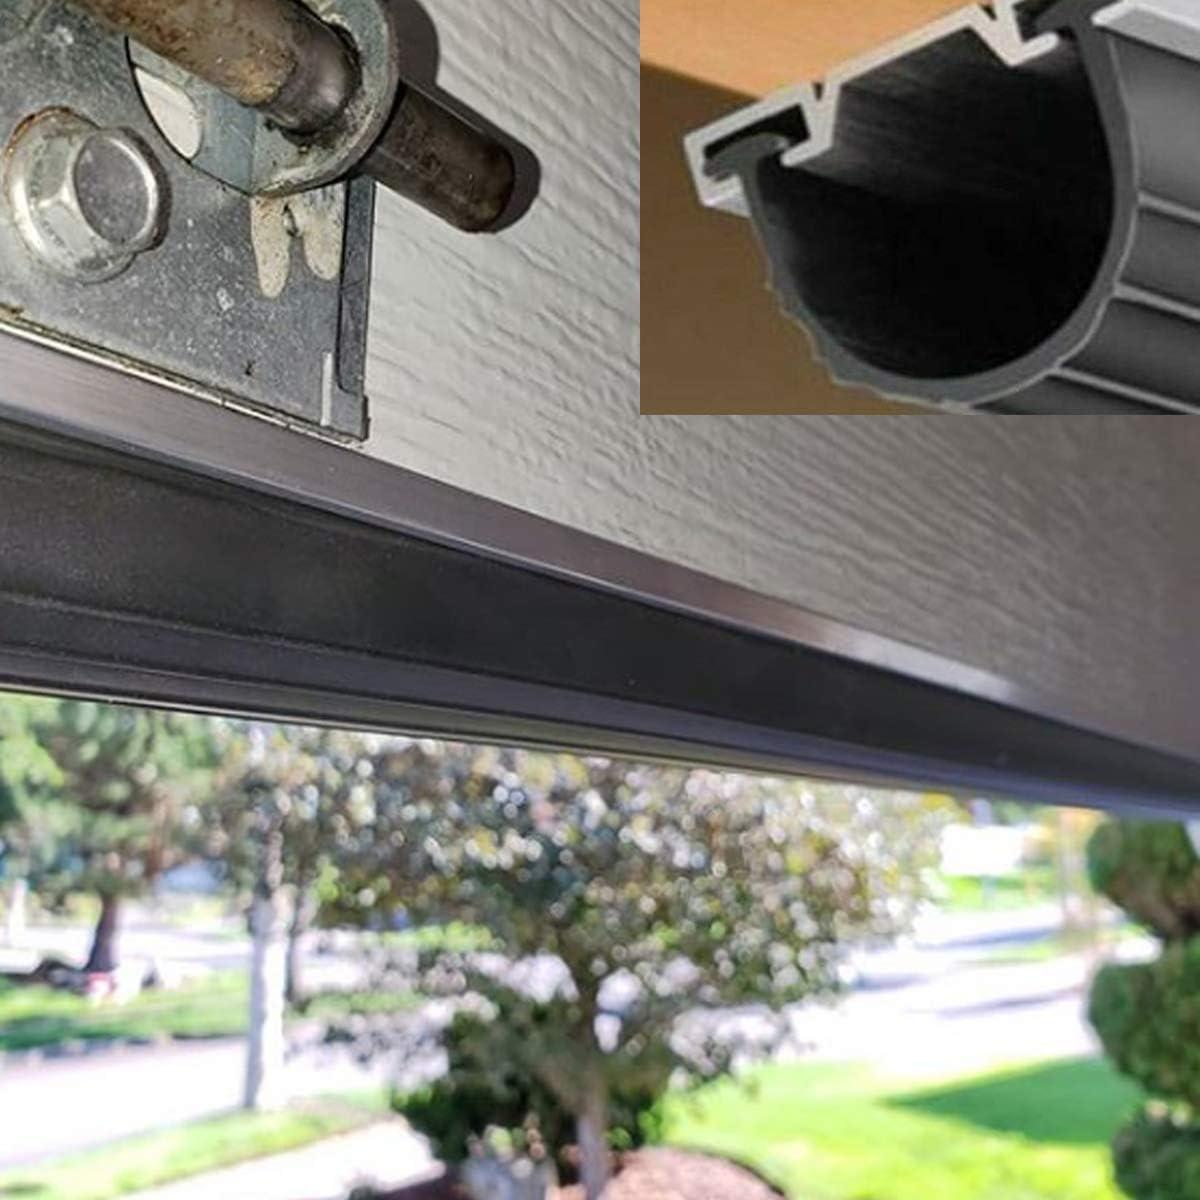 Garage Door Bottom Weather Stripping Kit Rubber Seal Strip Replacement ,5//16 T Ends 20 Feet 3 3//4 Width